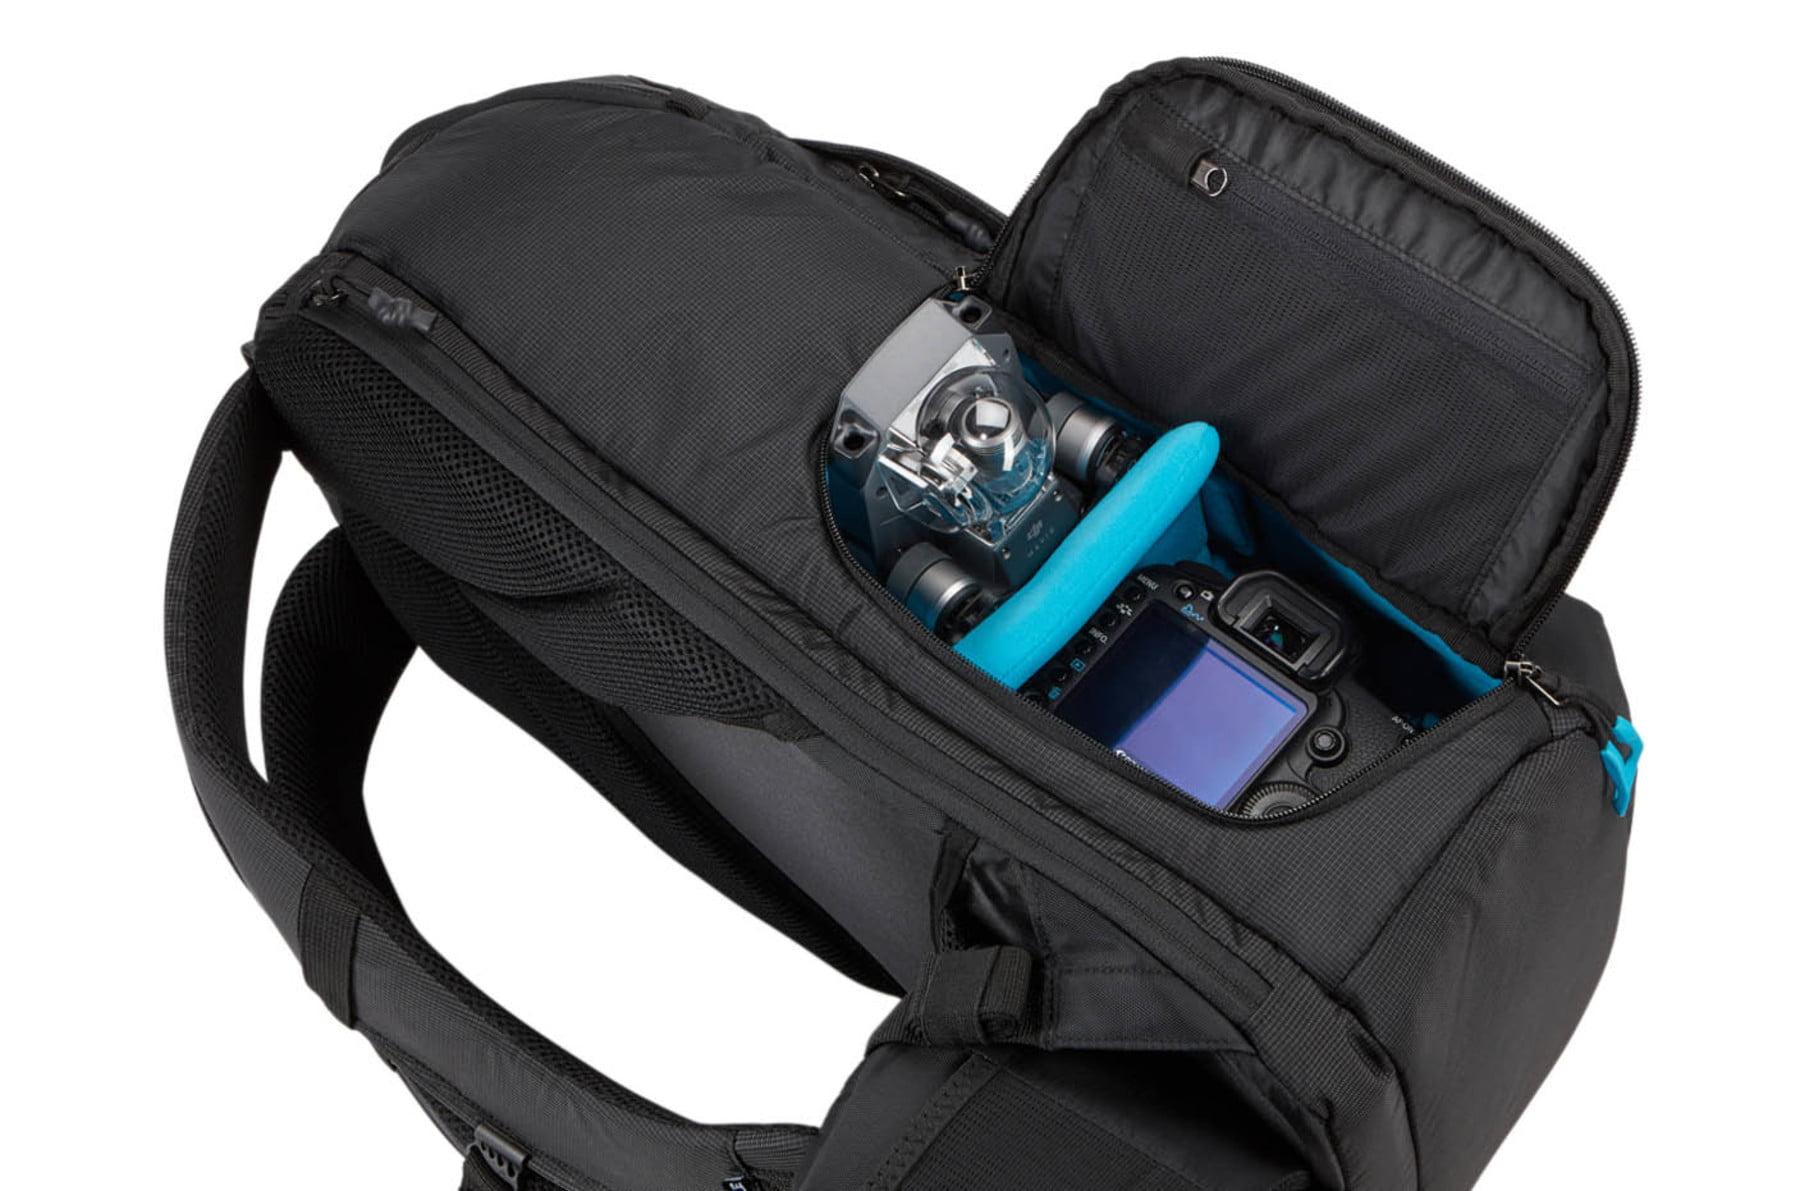 Rucsac foto Thule Aspect DSLR Backpack Negru 4